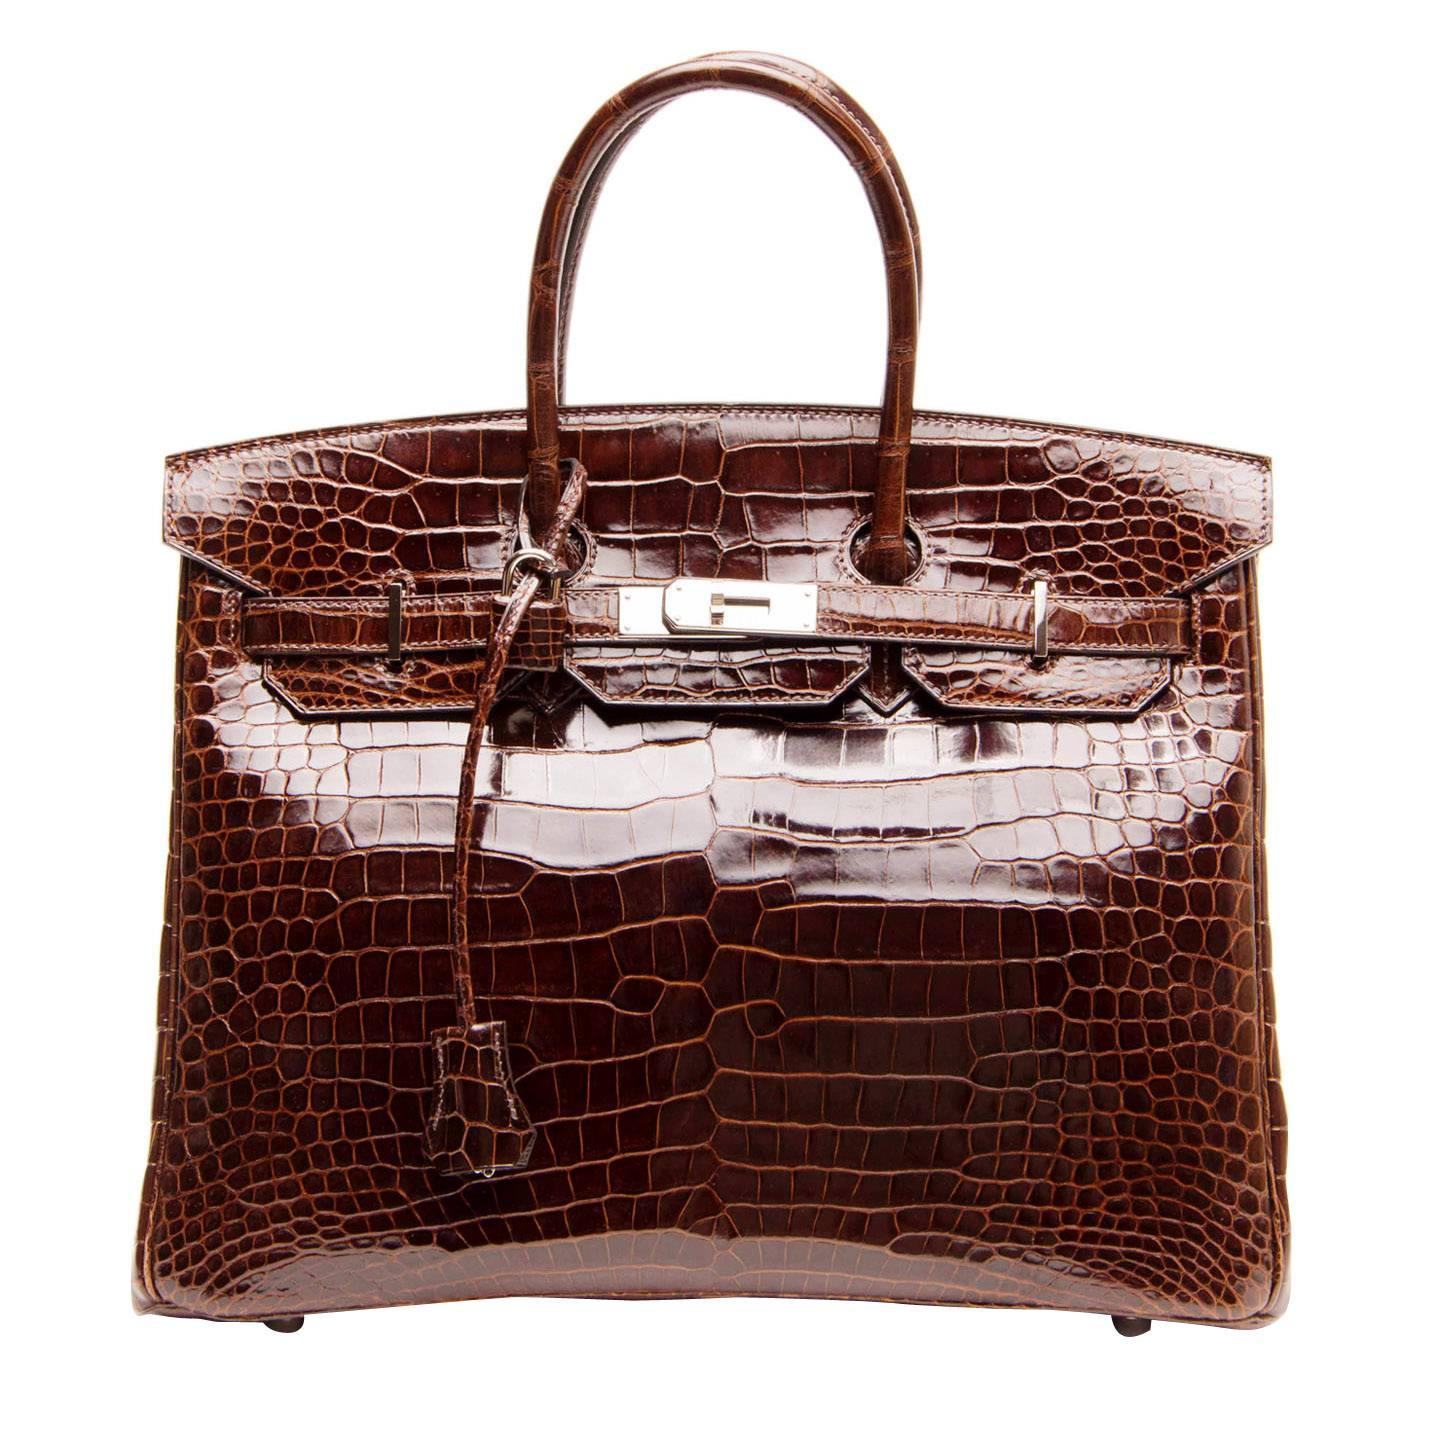 Hermès Birkin Chocolate Brown Porosus Crocodile Bag 35cm W Palladium Hardware For At 1stdibs